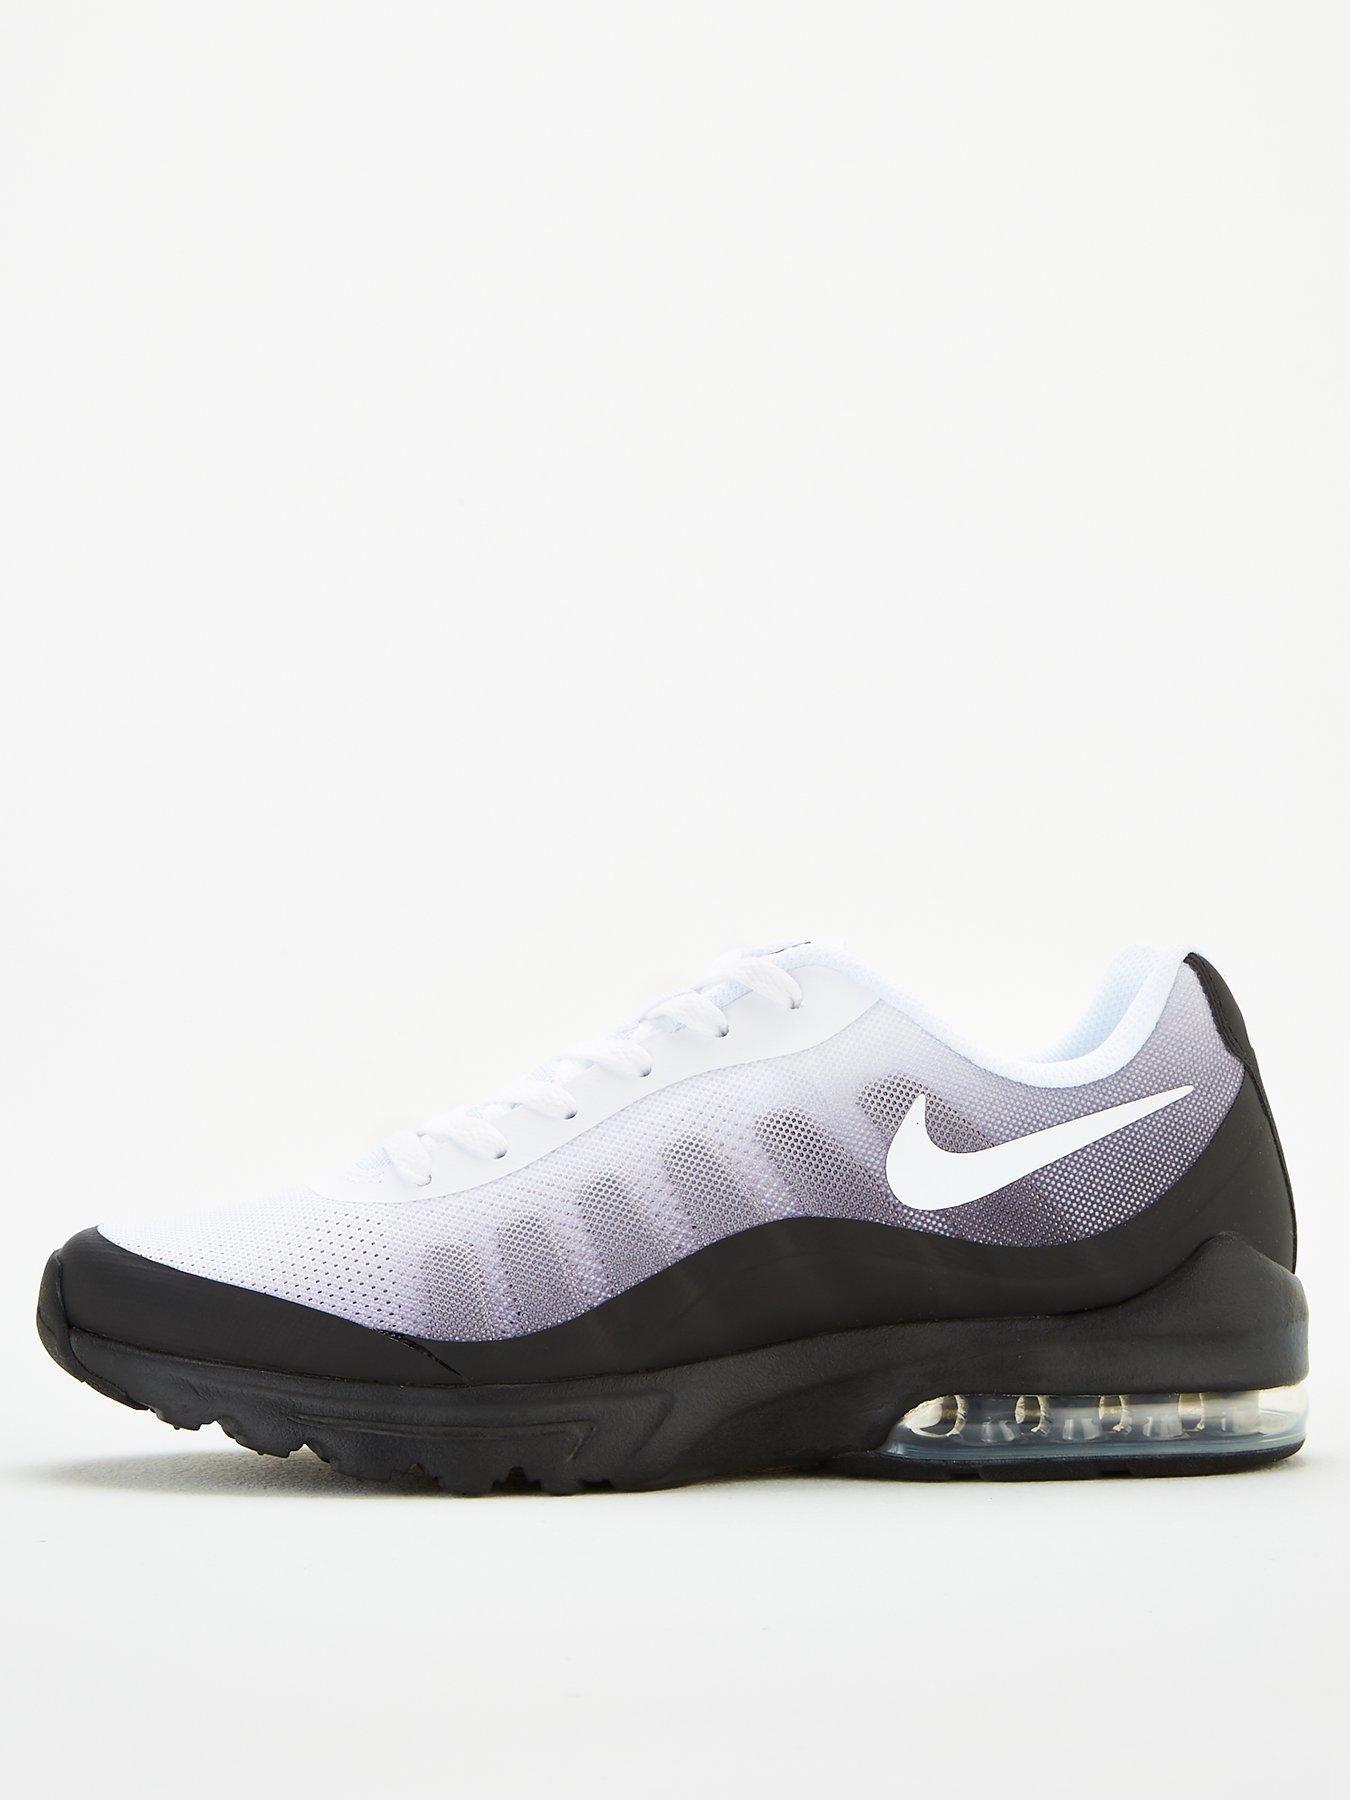 Shoes Nike AIR MAX INVIGOR PRINT